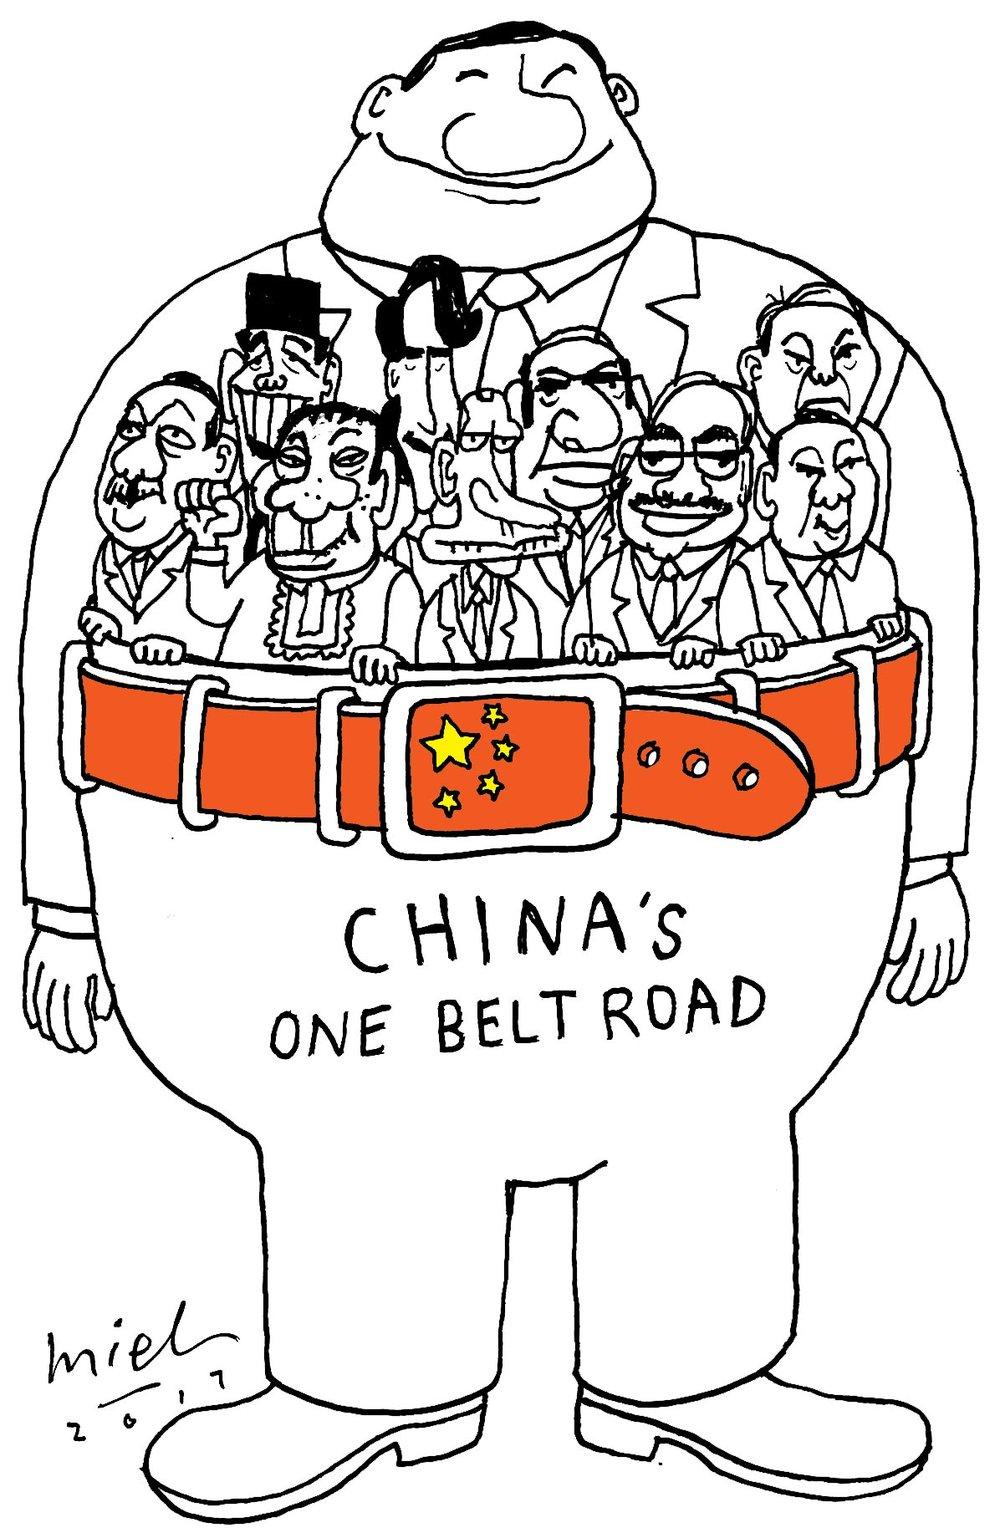 chinaonebeltroad.jpg